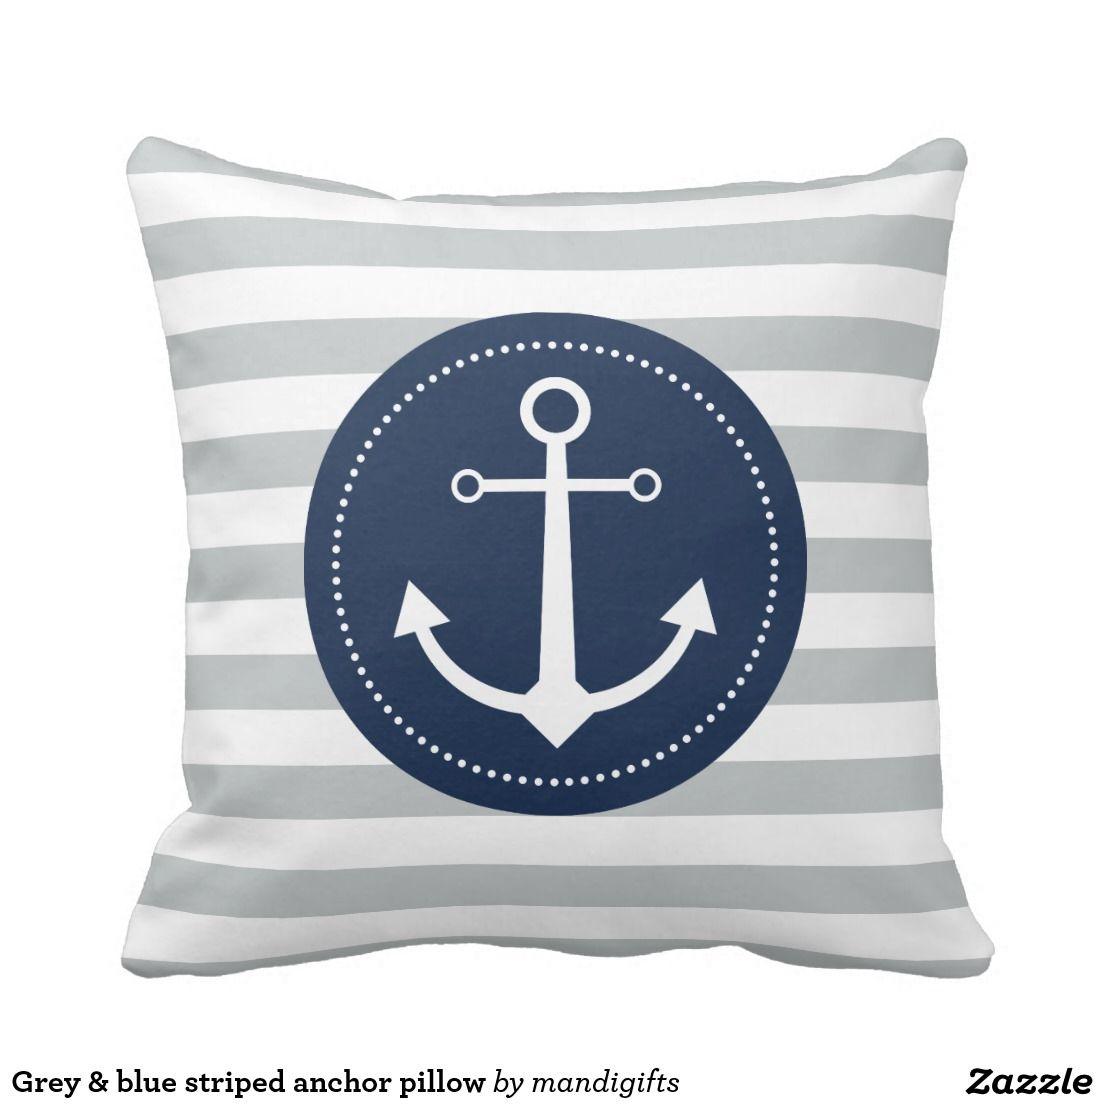 Grey & blue striped anchor pillow